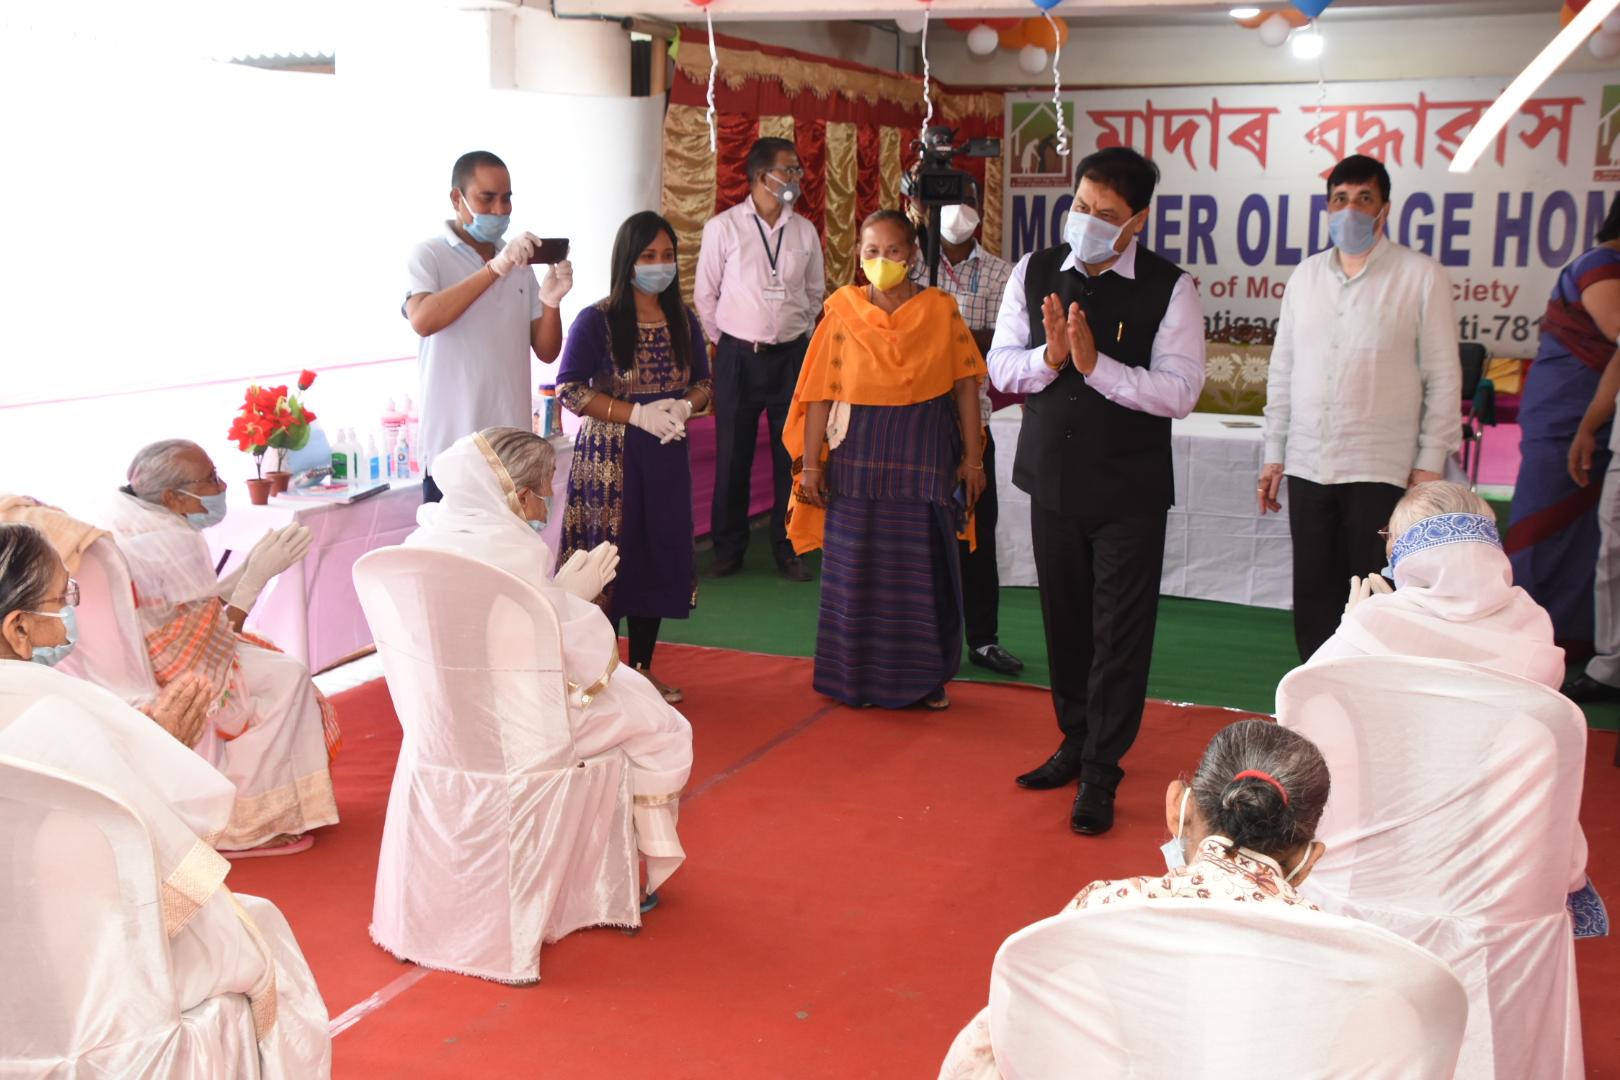 visit to the State Home of Women at Jalukbari